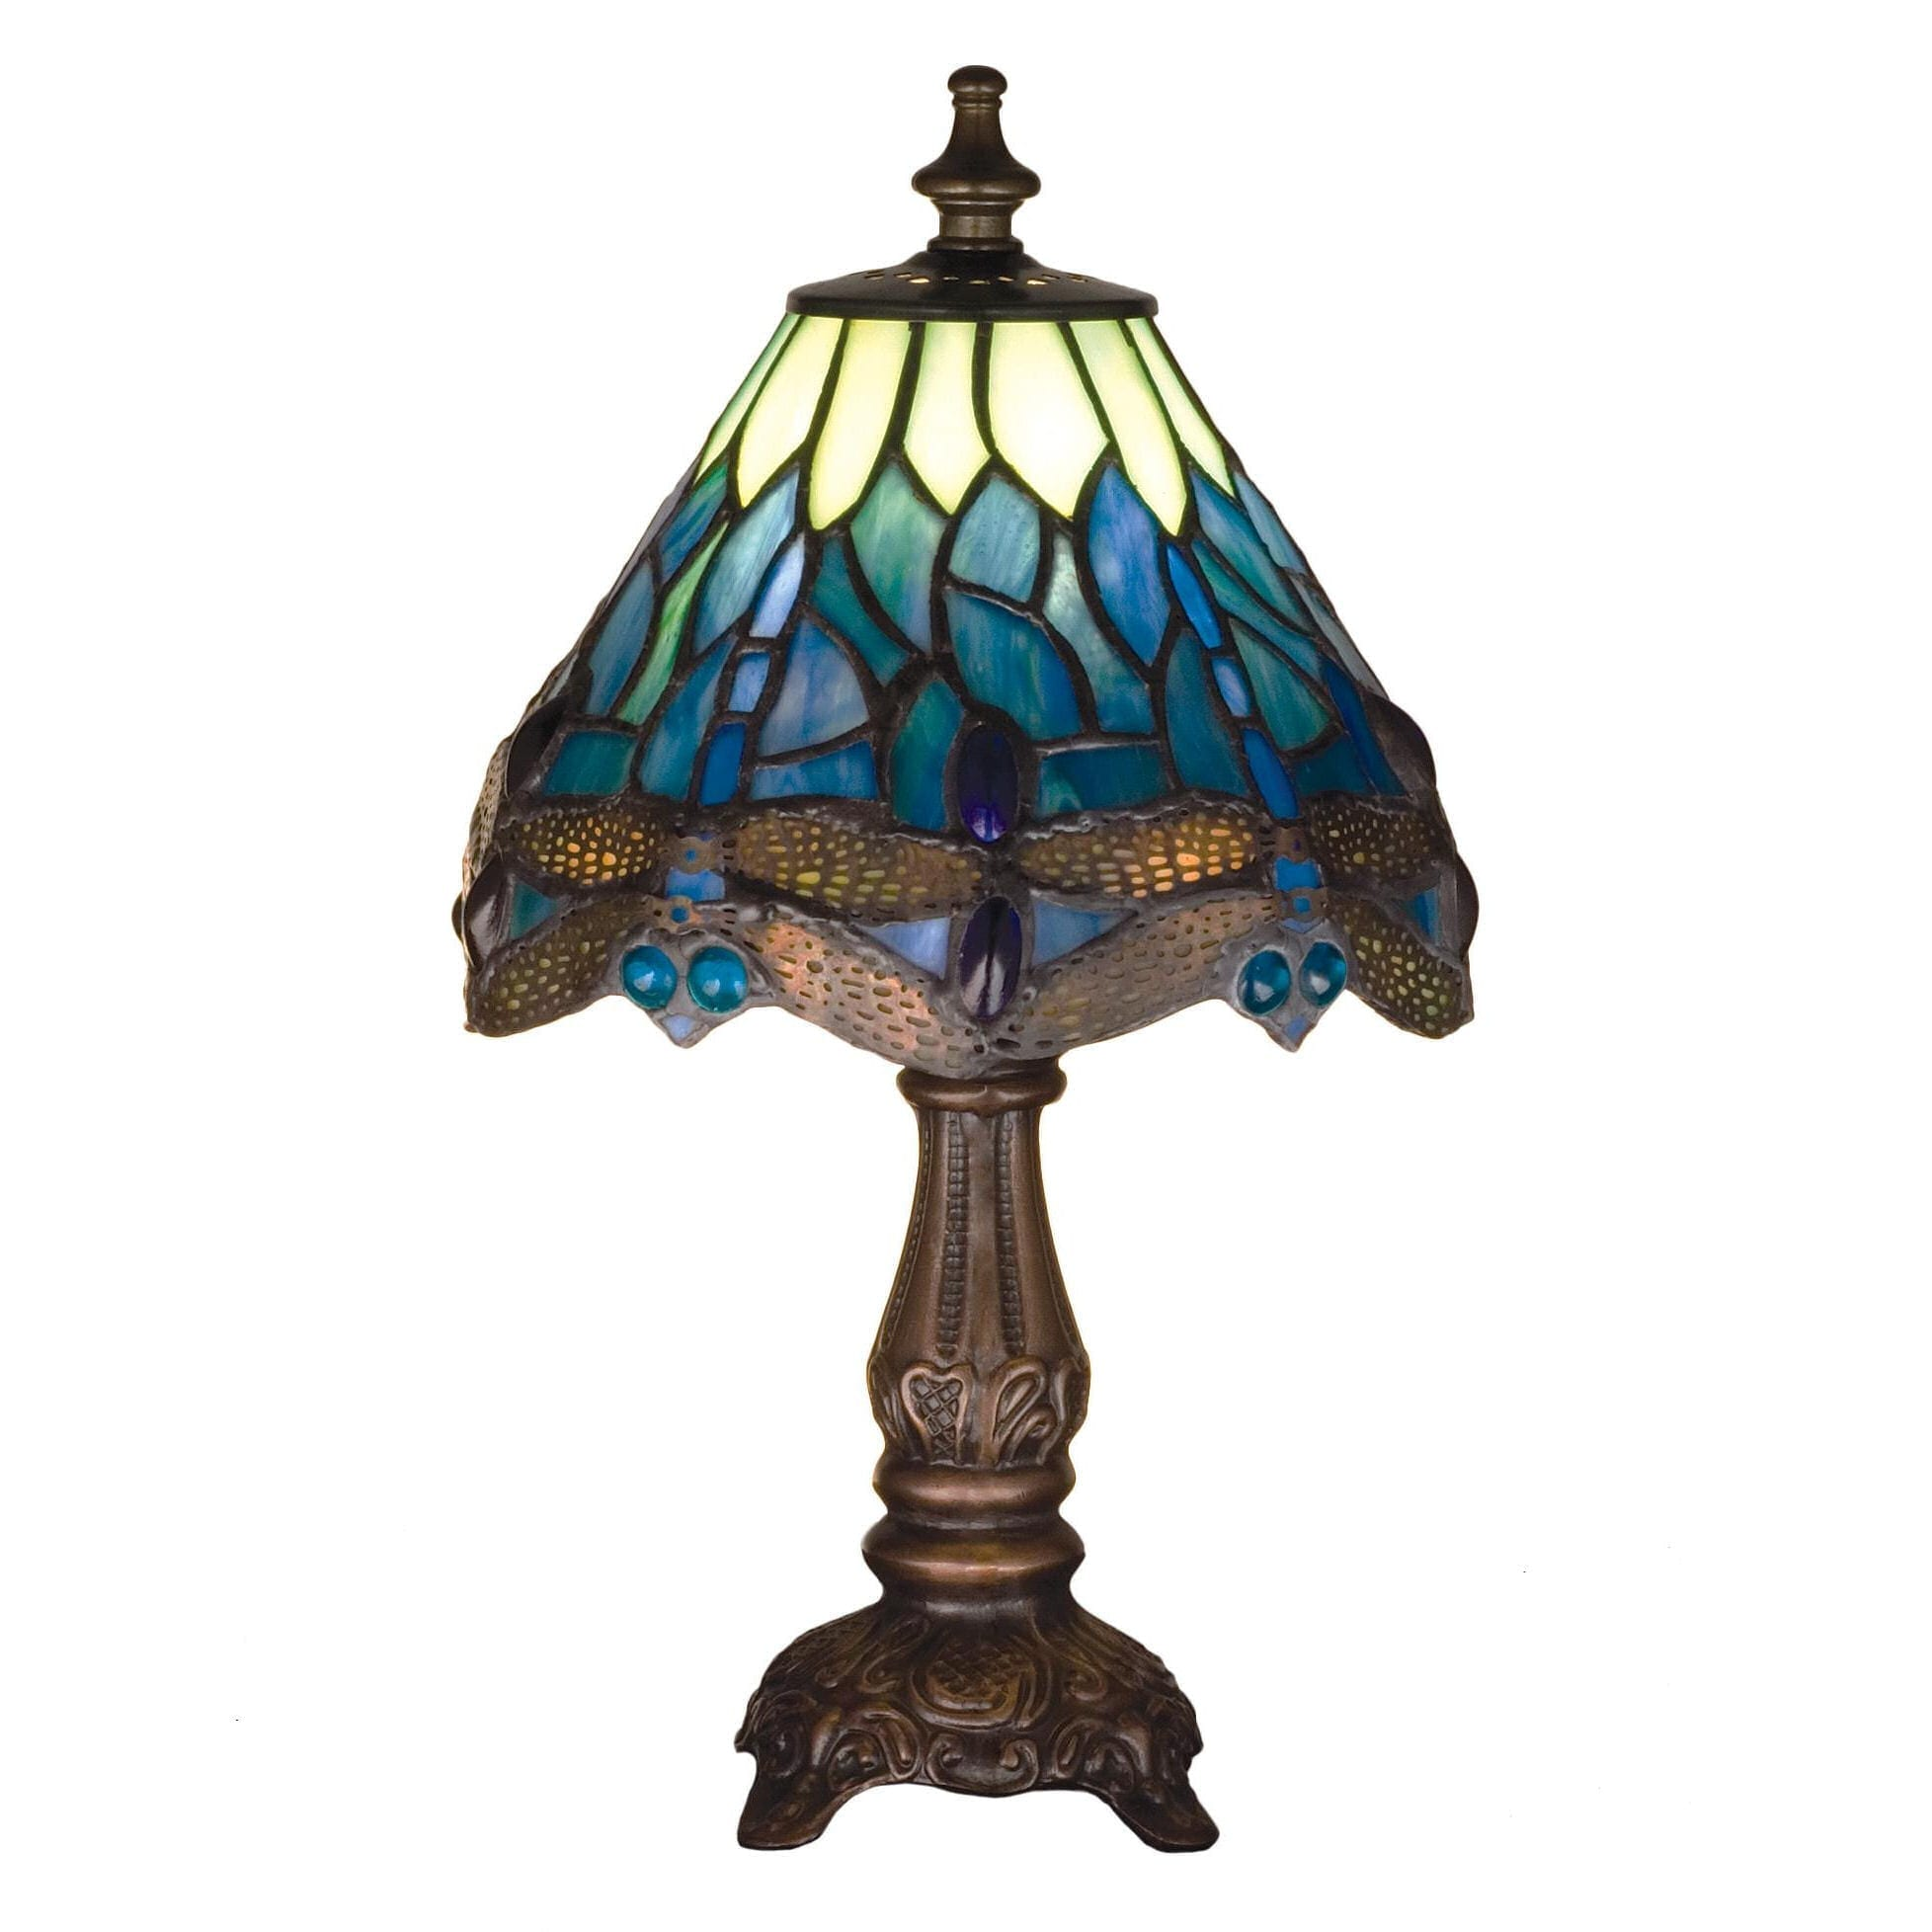 Small Tiffany Blue Dragonfly Lamp Romantic Dinner Table Lighting